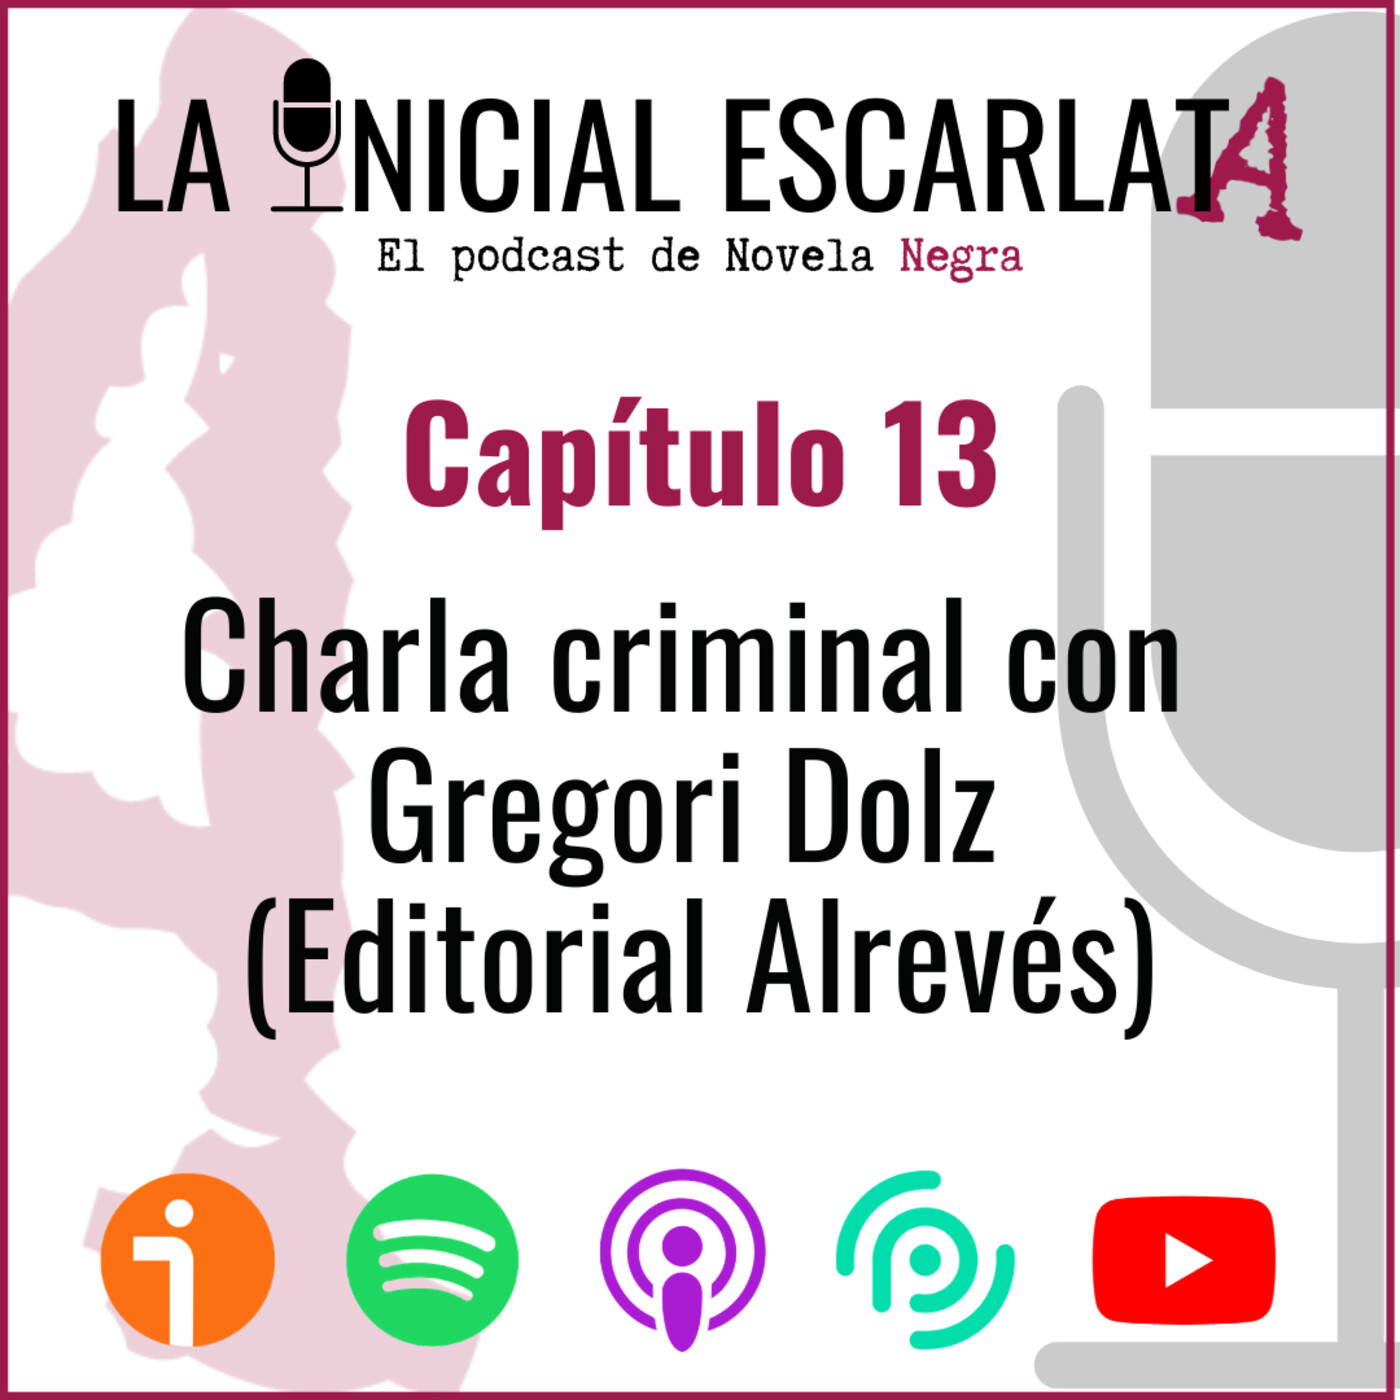 Capítulo 13: Charla criminal con Gregori Dolz (Editorial Alrevés)